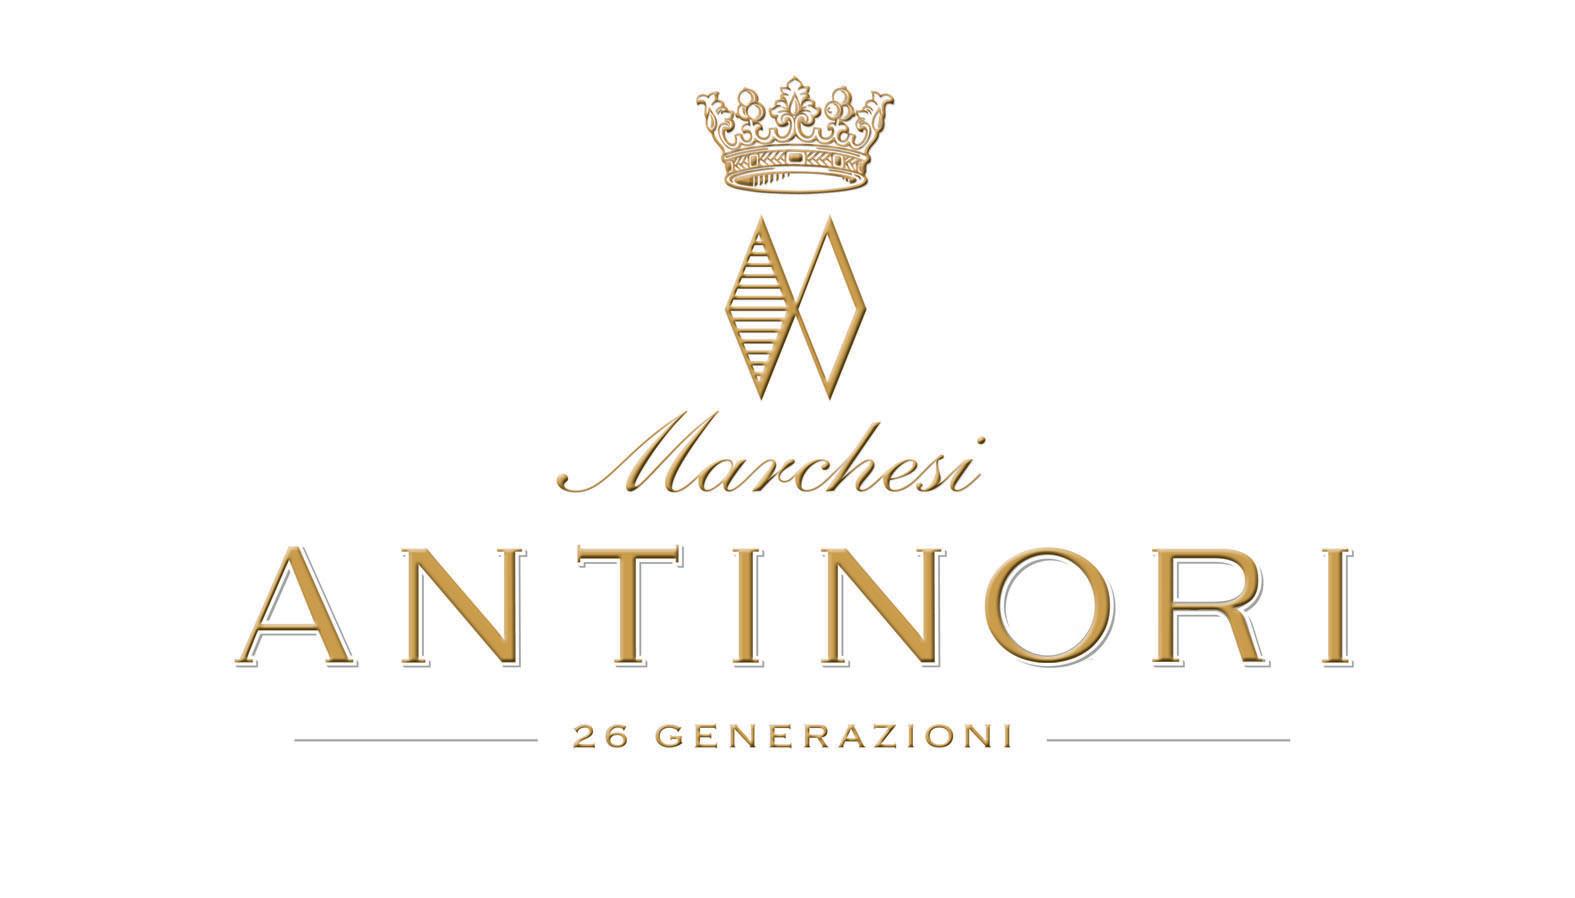 Antinori Logo JPEG.jpg